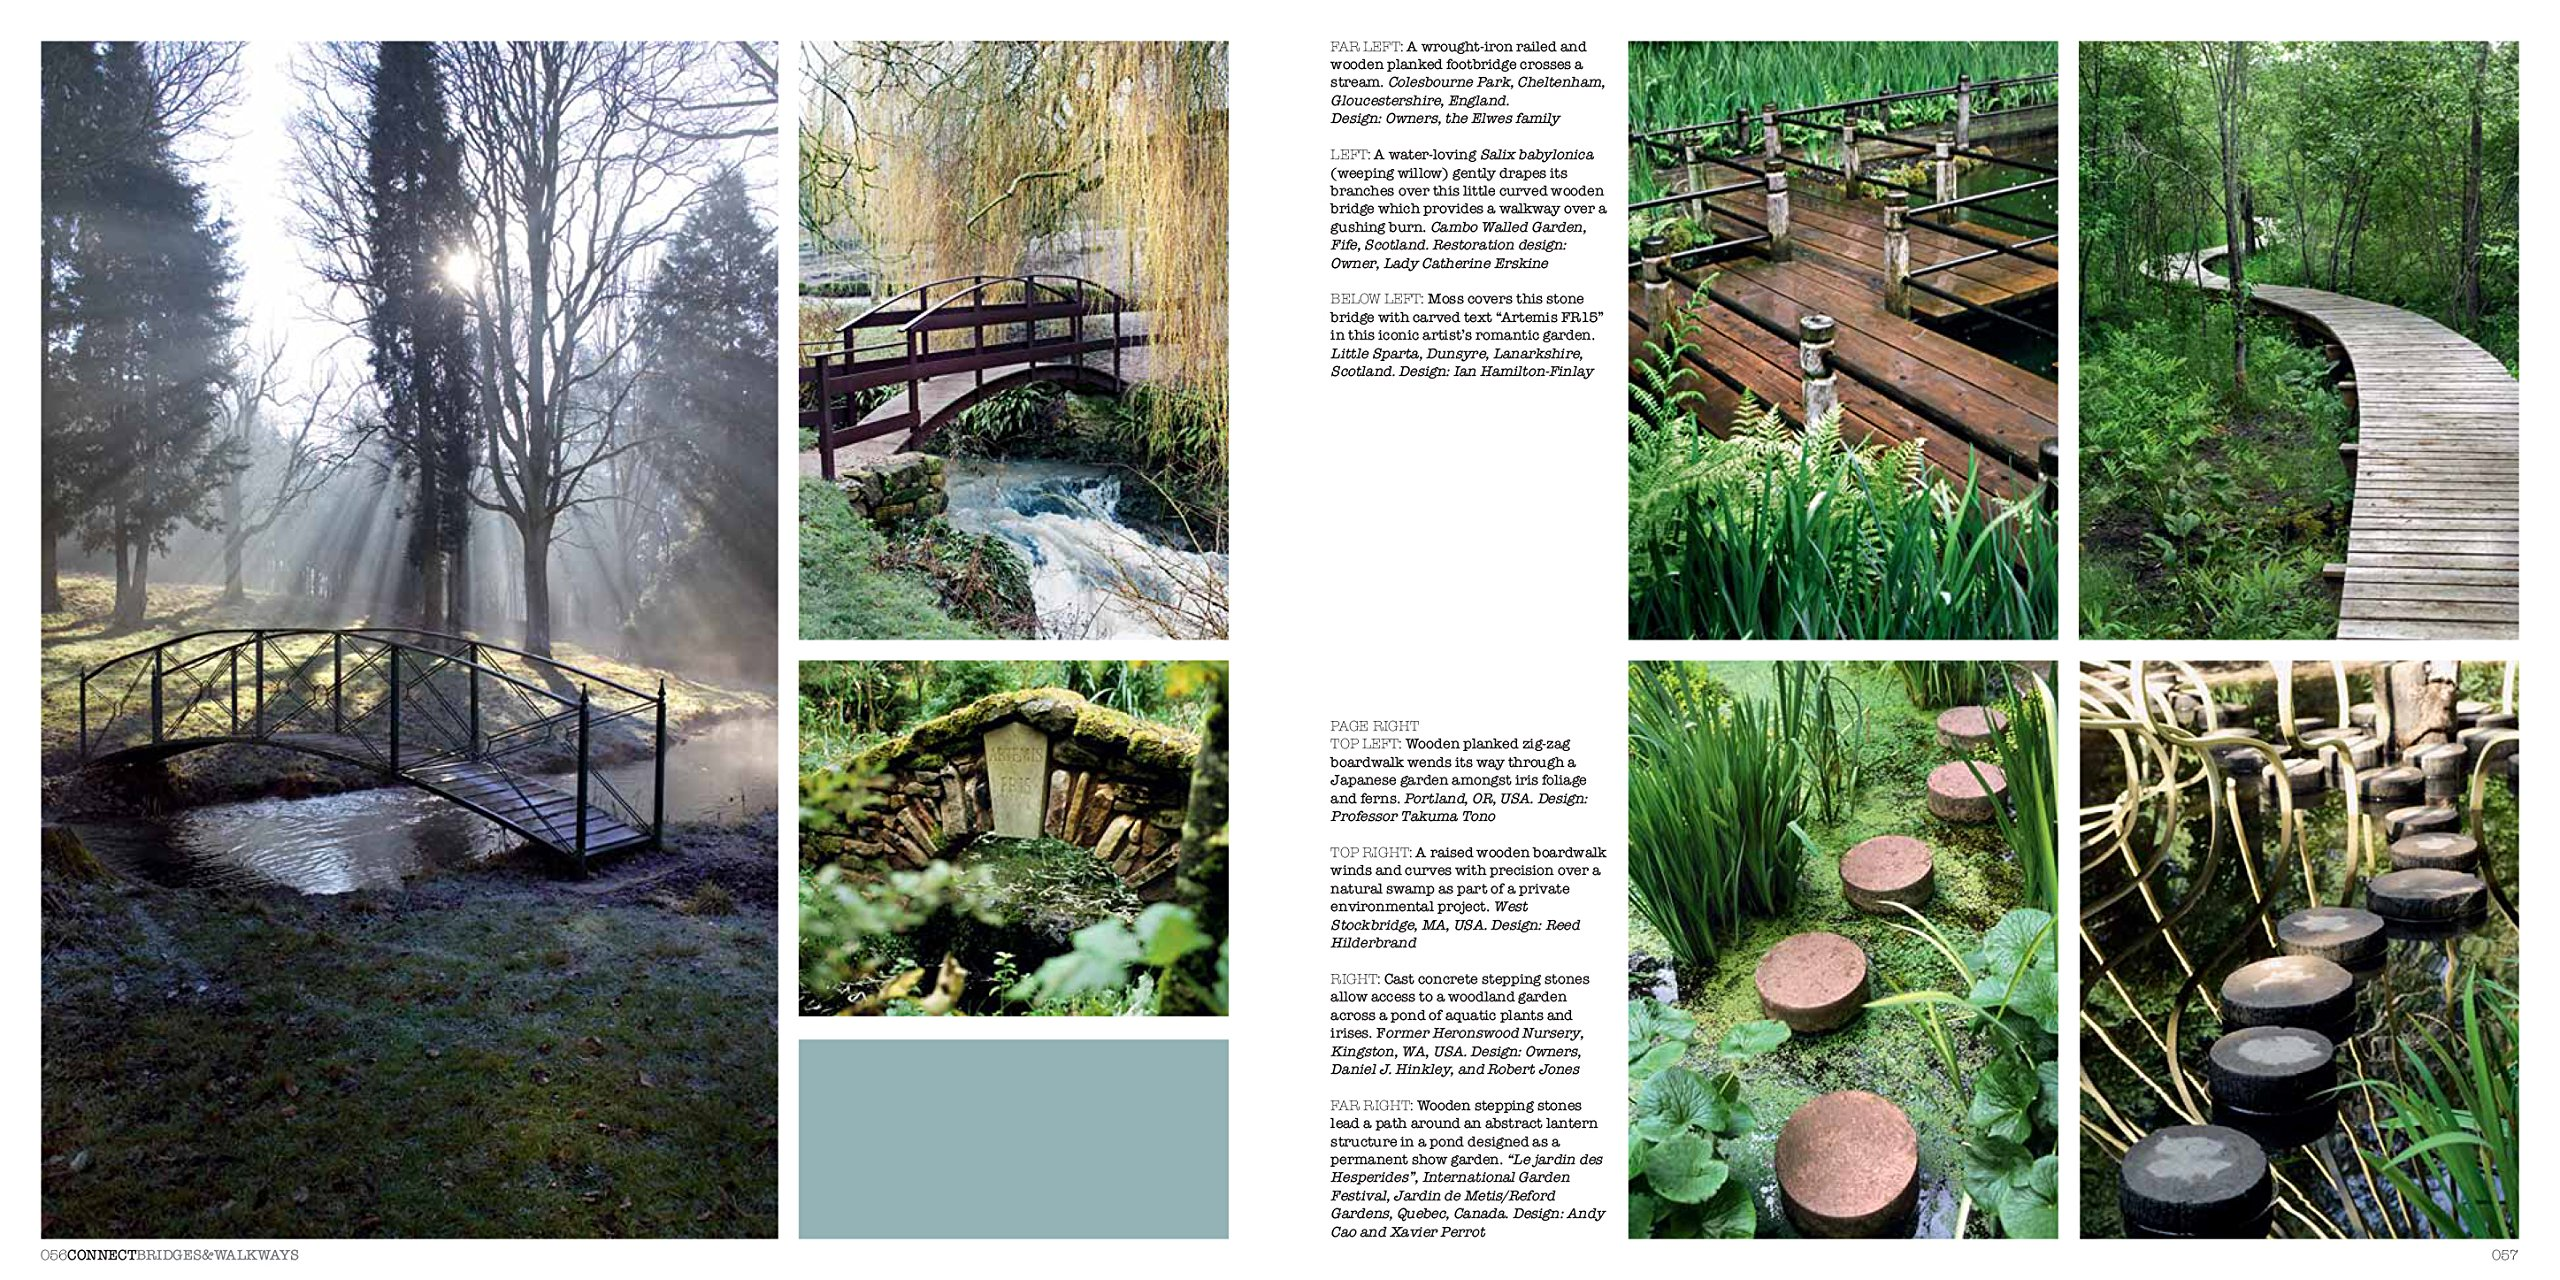 Meubles De Jardin Hesperides Génial the Garden source Inspirational Design Ideas for Gardens